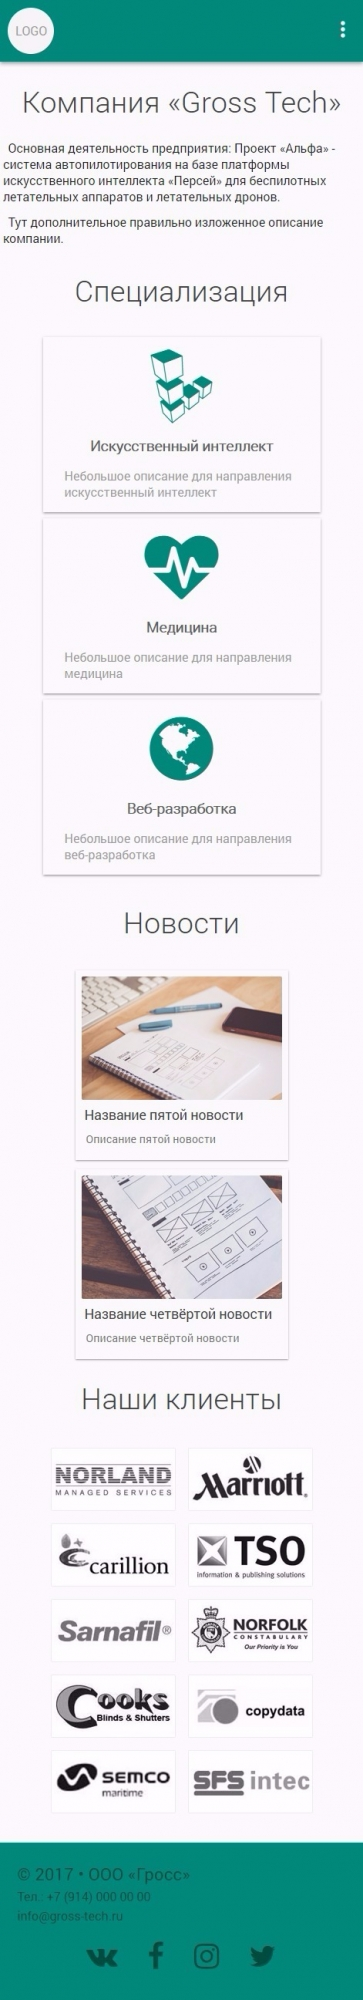 Gross Tech - концепт веб-сайта